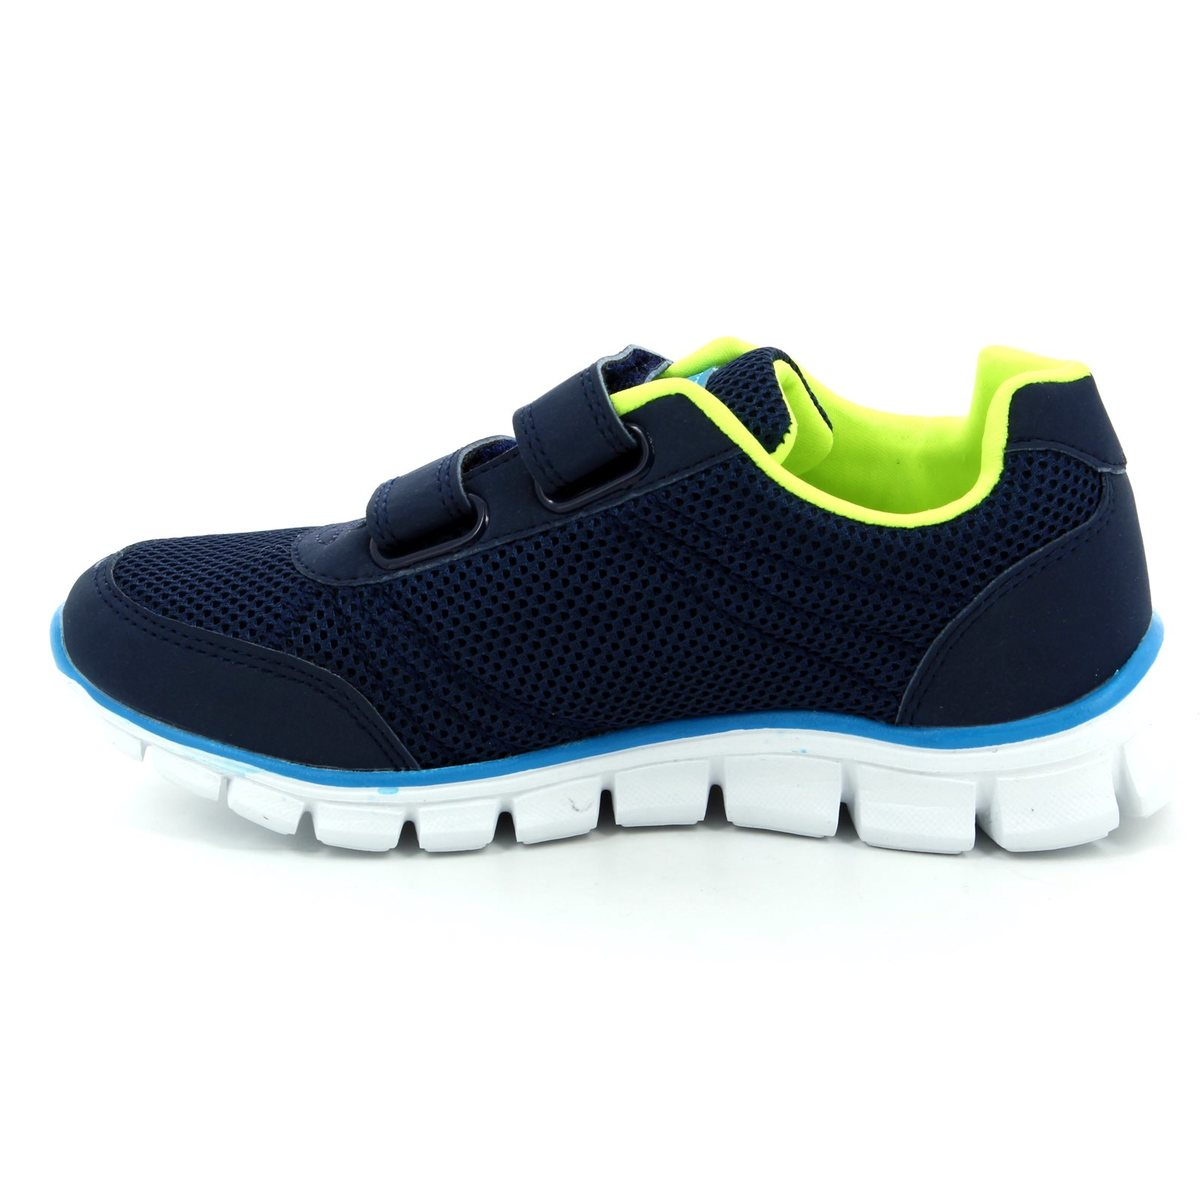 93d2627e0d Begg Exclusive Everyday Shoes - Navy multi - 811201 45 FLEX HENGST